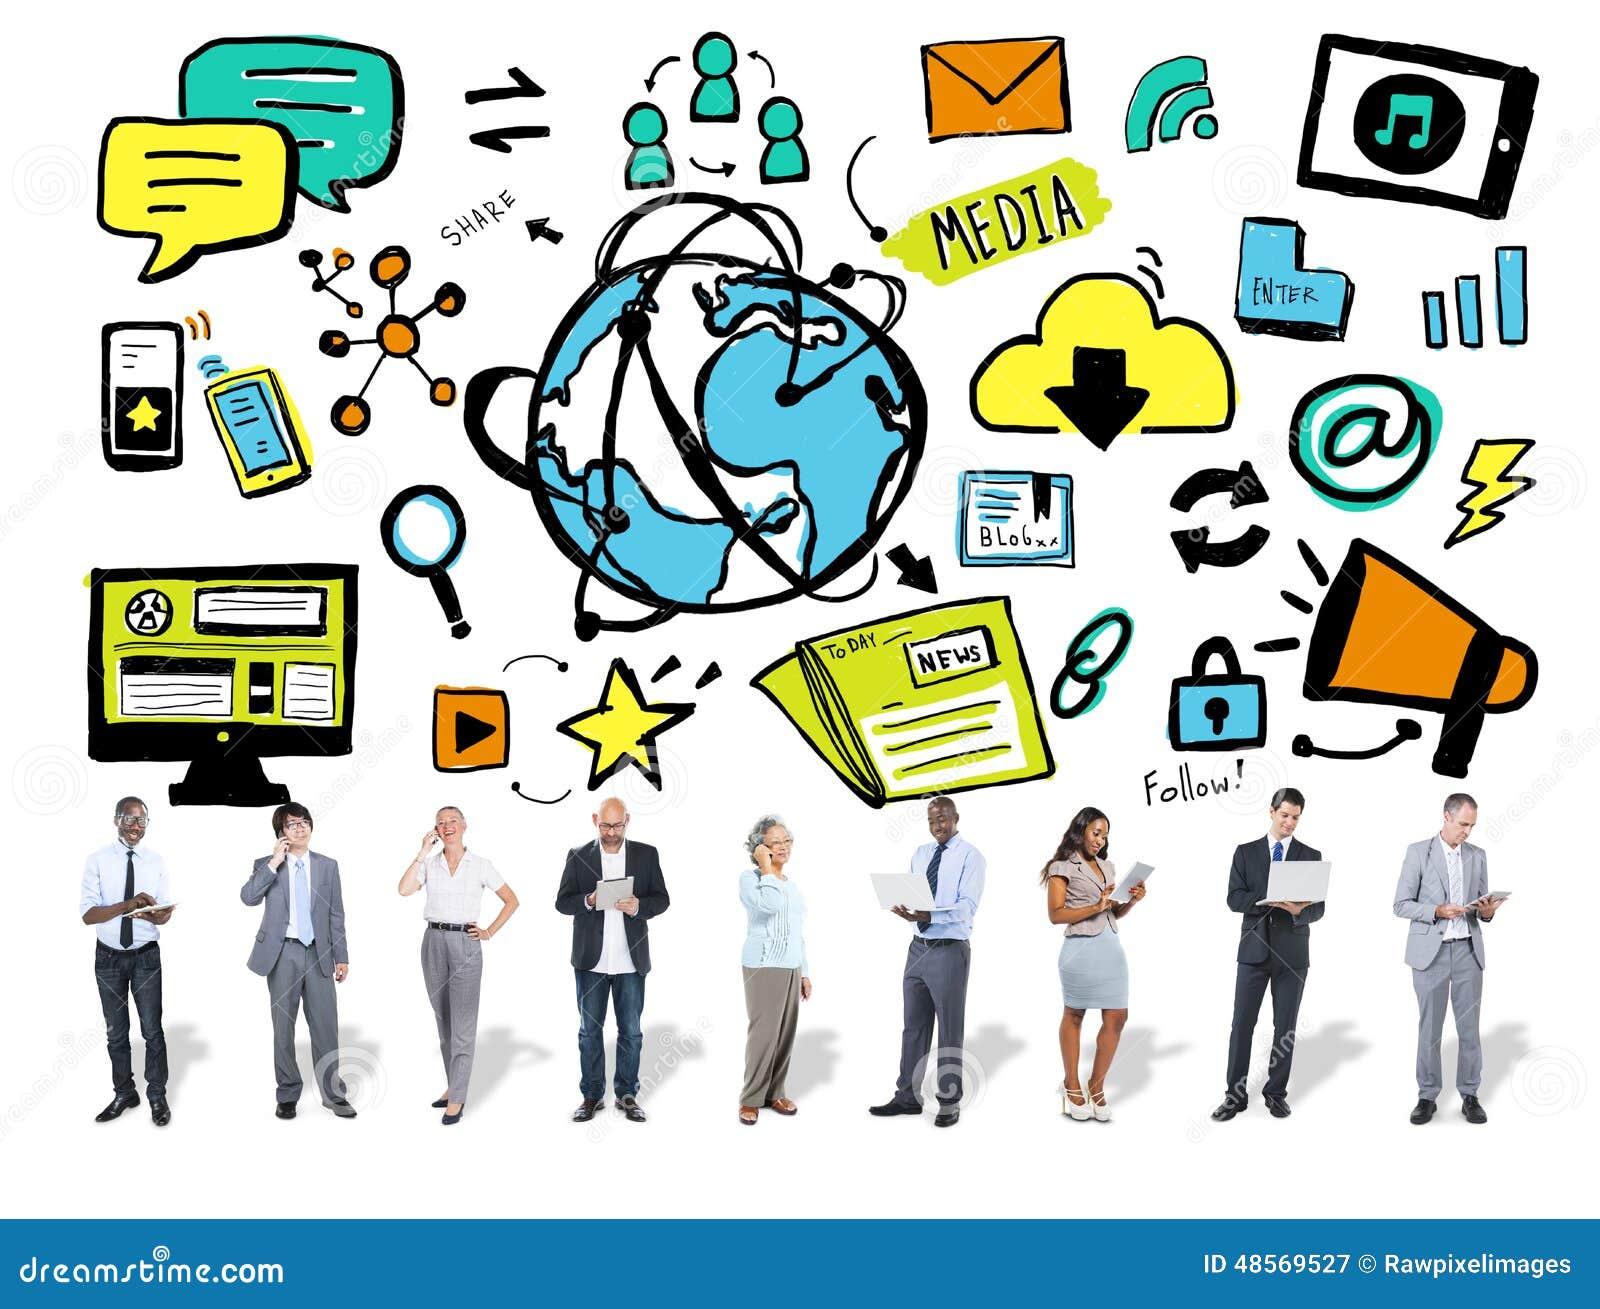 Digital Communications and Media/Multimedia